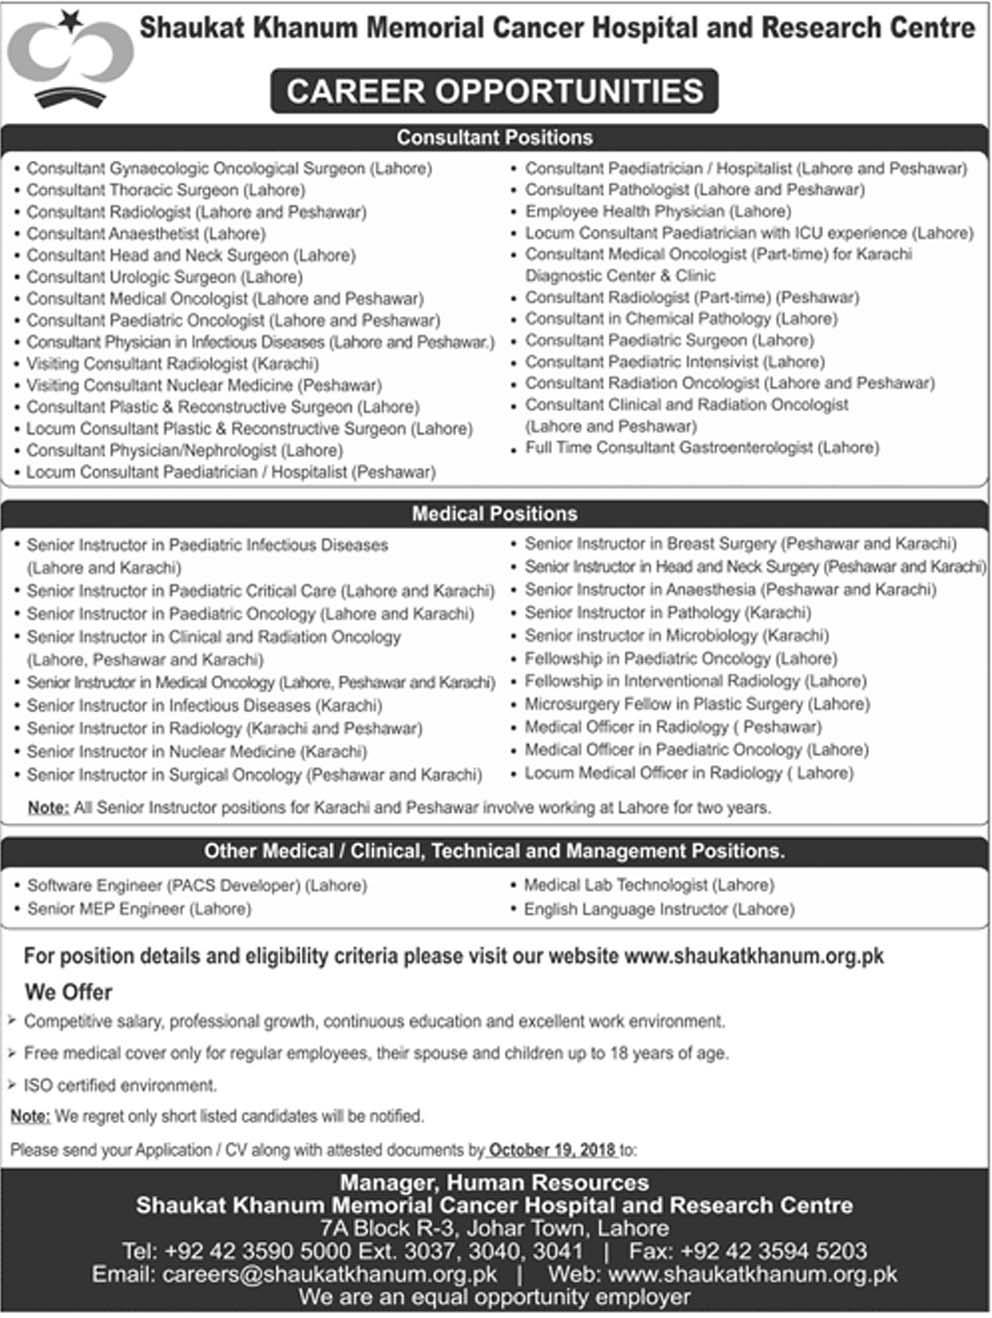 Shaukat Khanum Hospital Jobs Application Form 2018